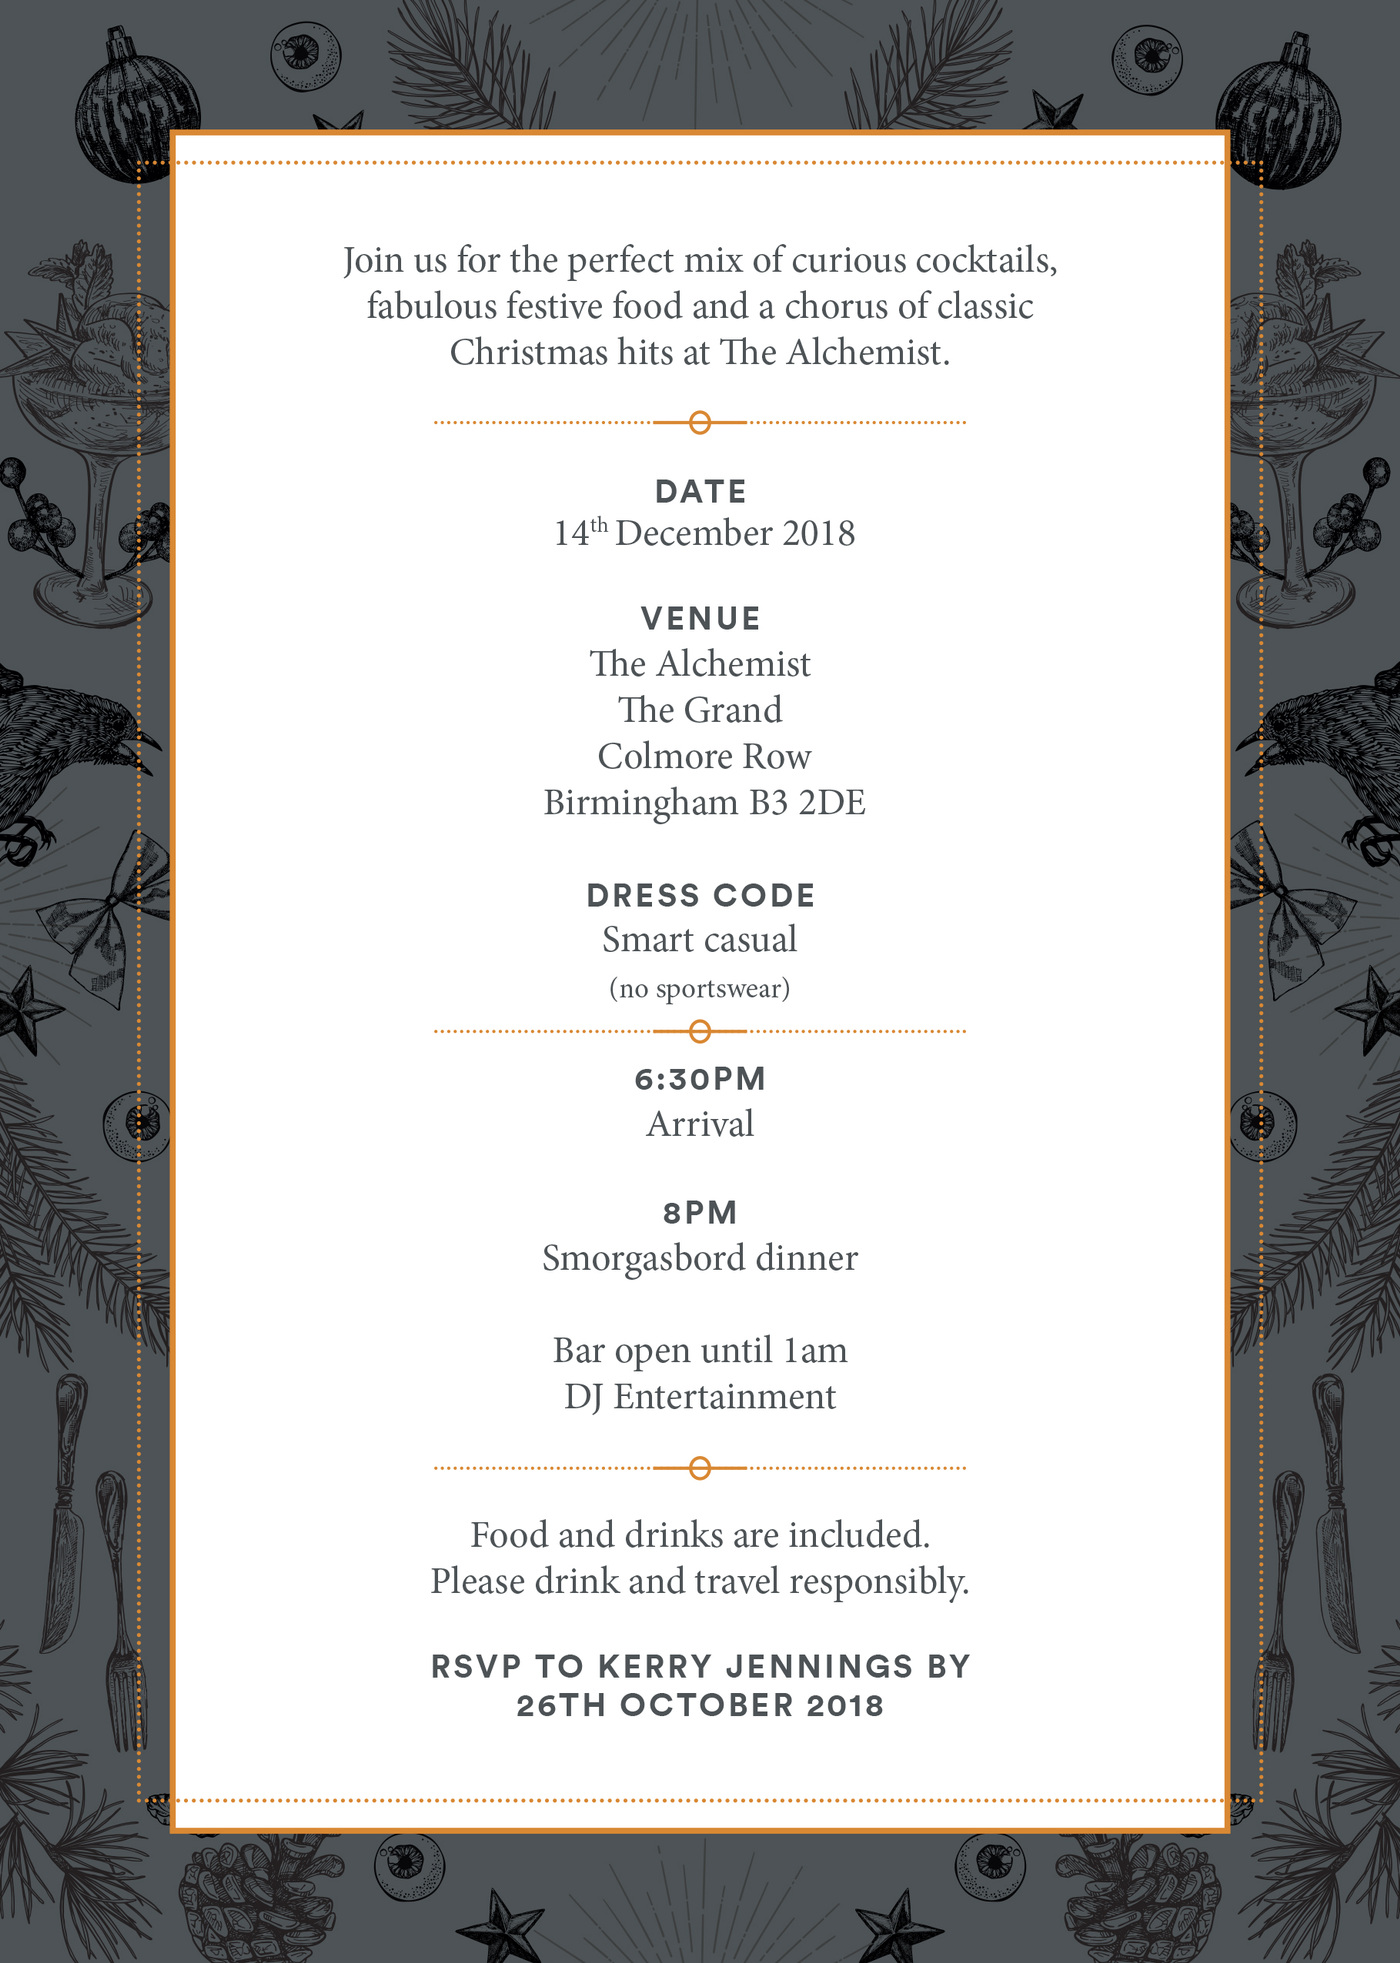 Lara-Jane van Antwerpen - Christmas Office Invite Back